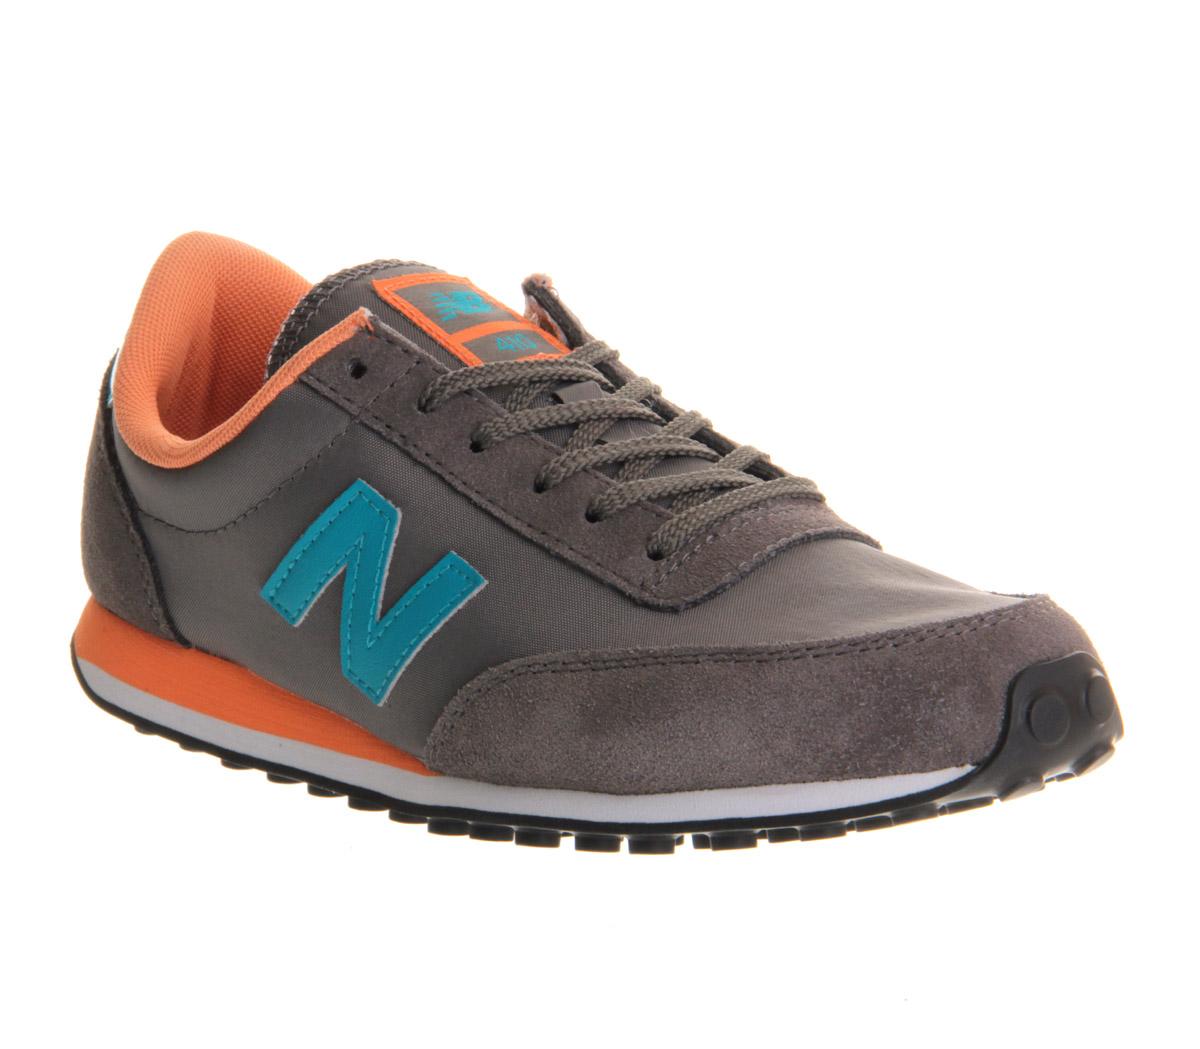 mens new balance 410 charcoal blue orange st trainers. Black Bedroom Furniture Sets. Home Design Ideas